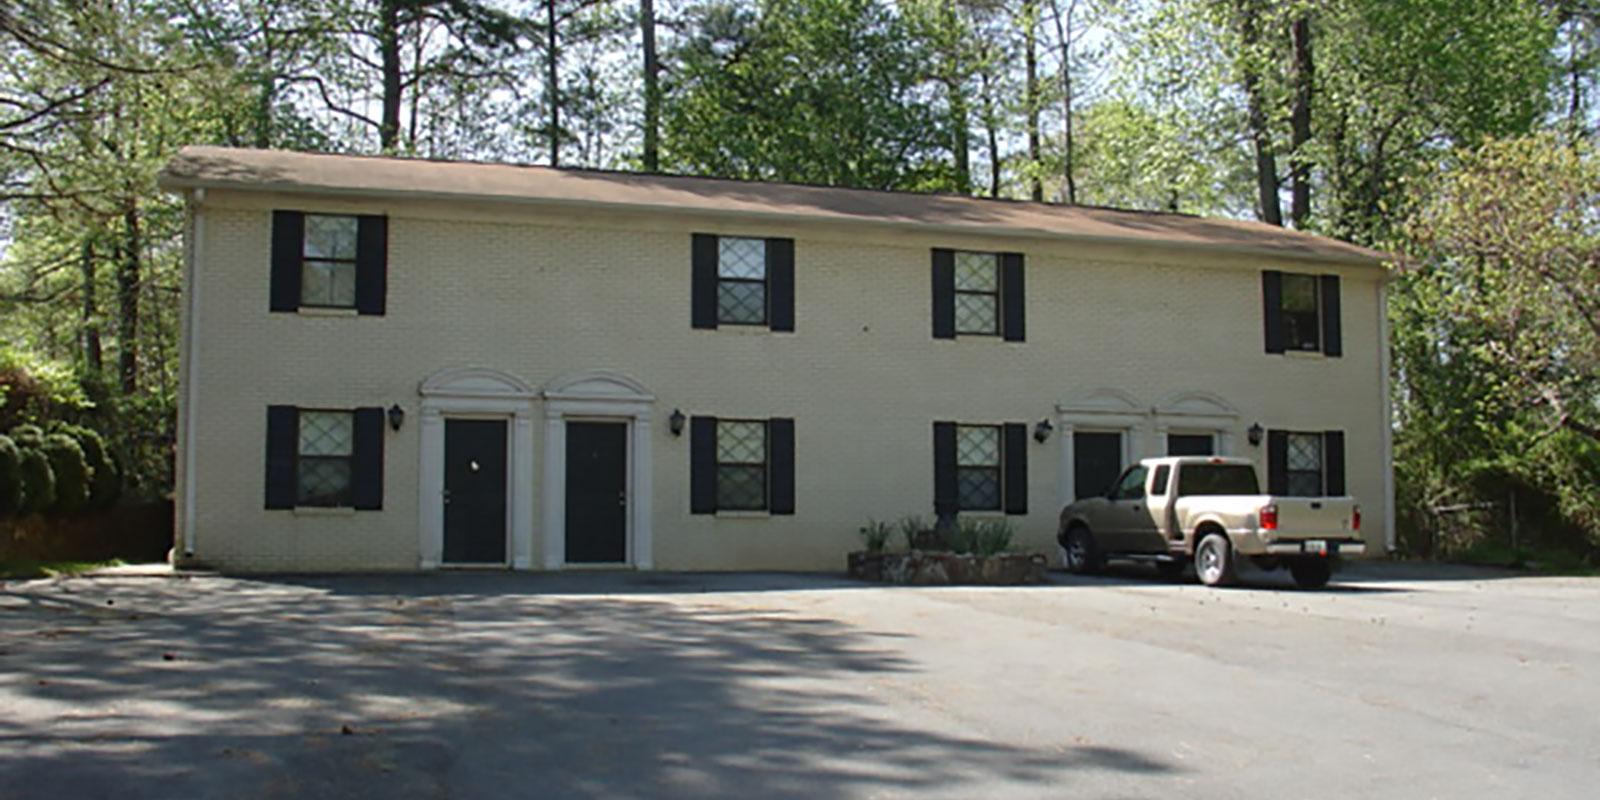 48-B Pinecrest Drive, Rome, Georgia 30165, 2 Bedrooms Bedrooms, ,1 BathroomBathrooms,Apartment,Rental,Pinecrest Drive,1007